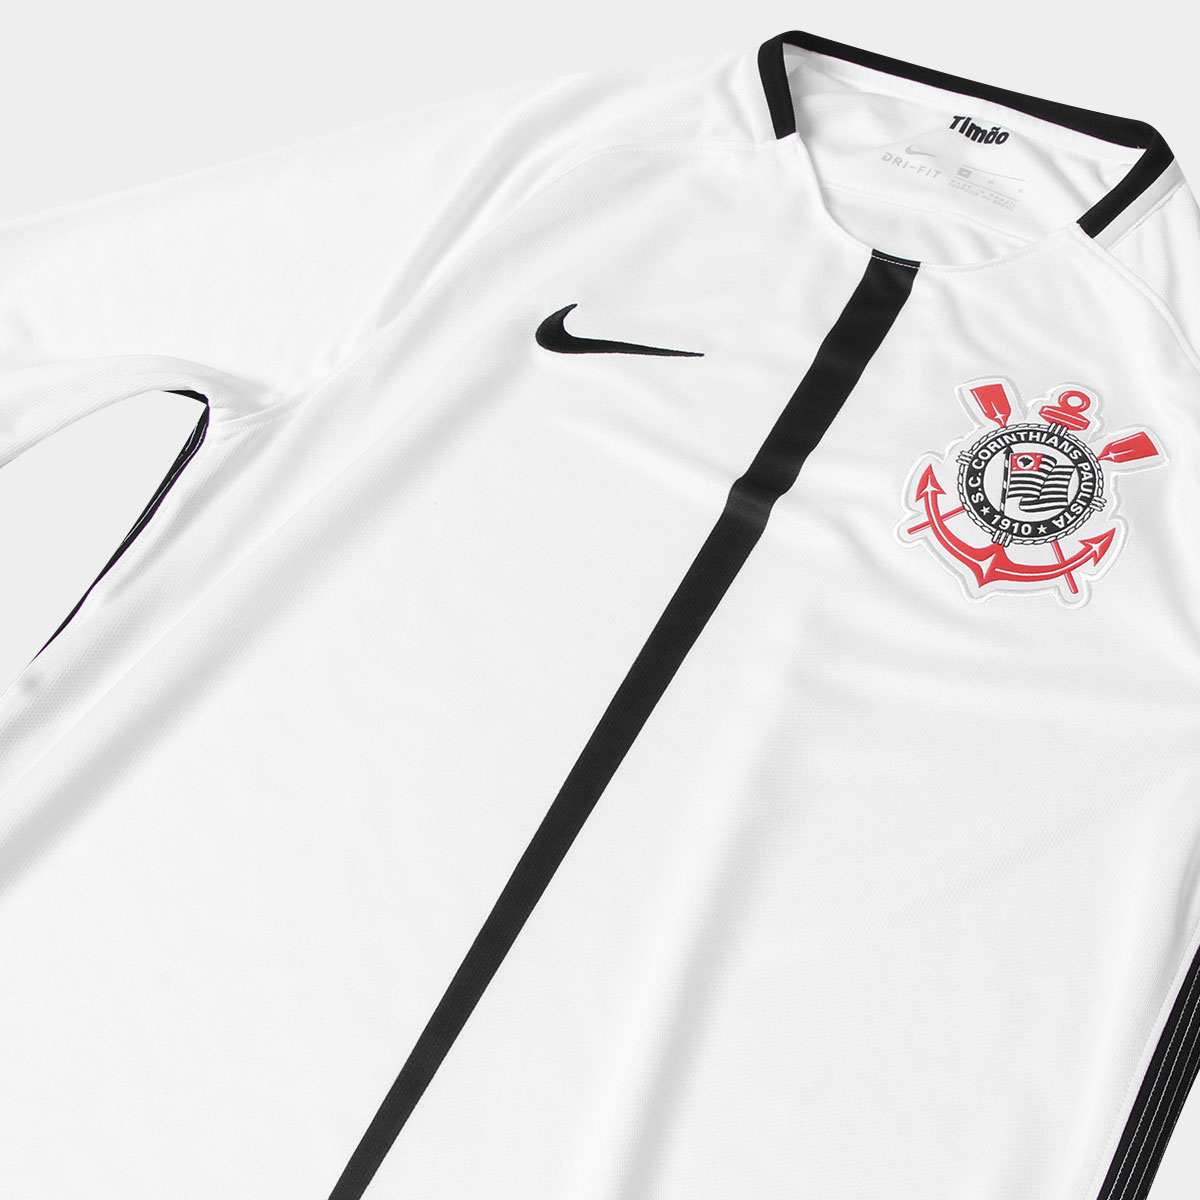 cad50b6b77 Camisa Nike Corinthians II 17 18 s nº Torcedor - Preto e Branco 1977 ...